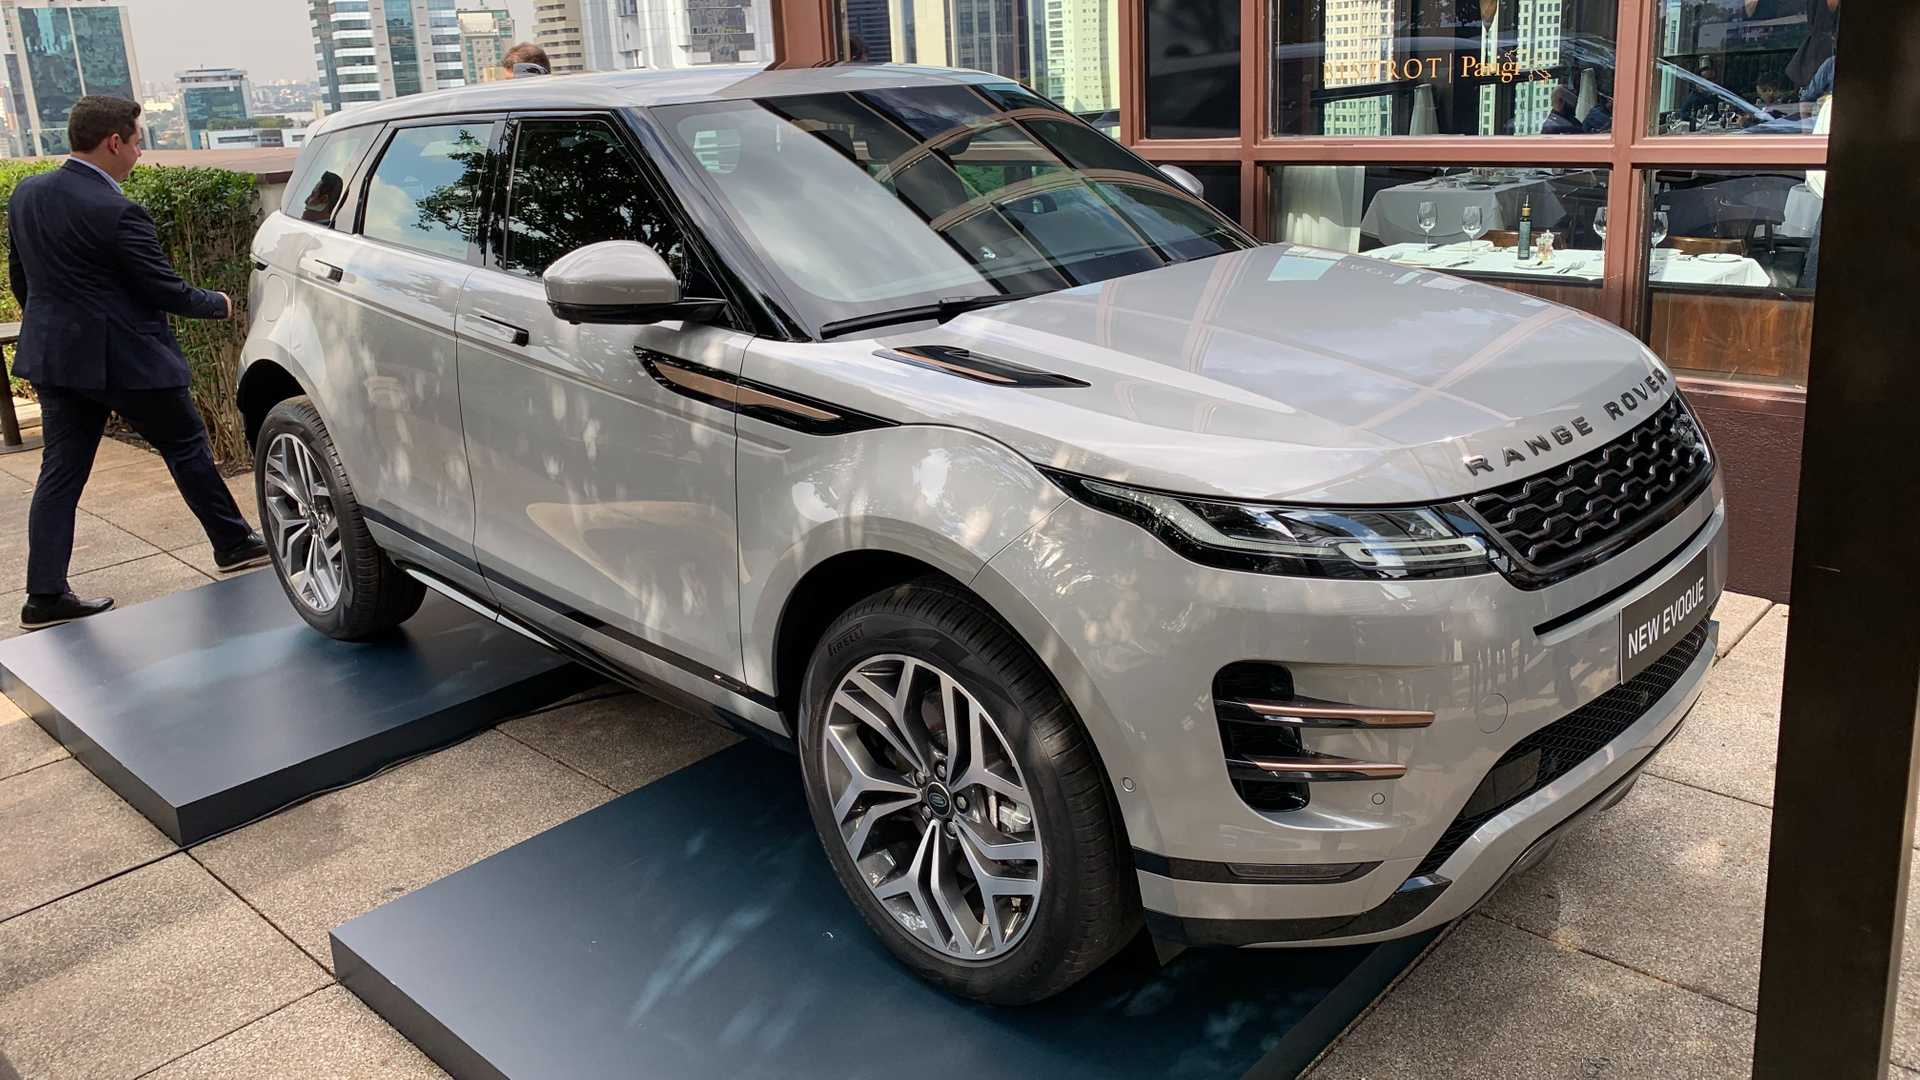 Novo Range Rover Evoque E Lancado No Brasil Veja Precos